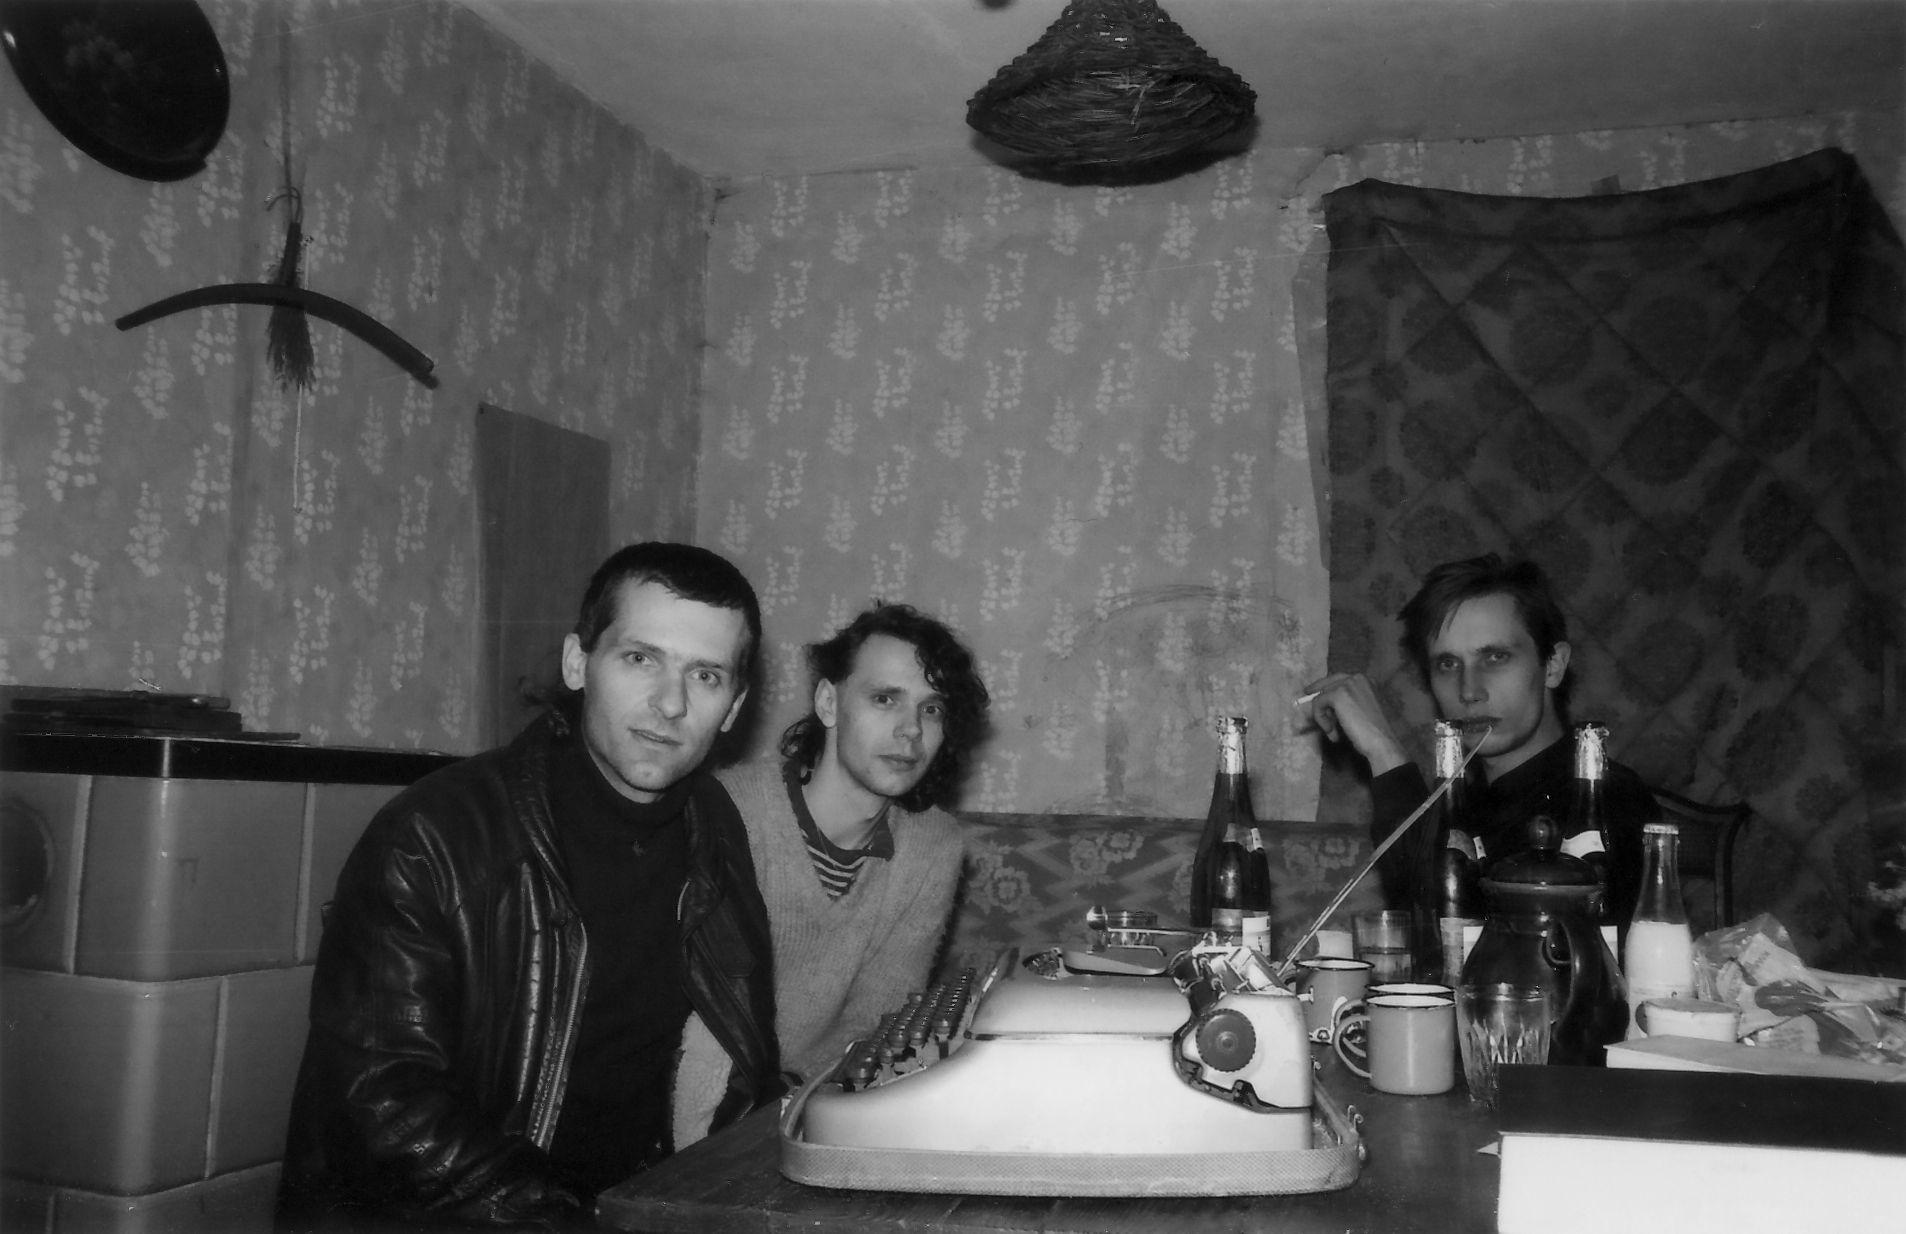 Jan Faktor, Bert Papenfuß und Stefan Döhring (v.l.n.r.) bei gemeinsamer Arbeit, 1984.